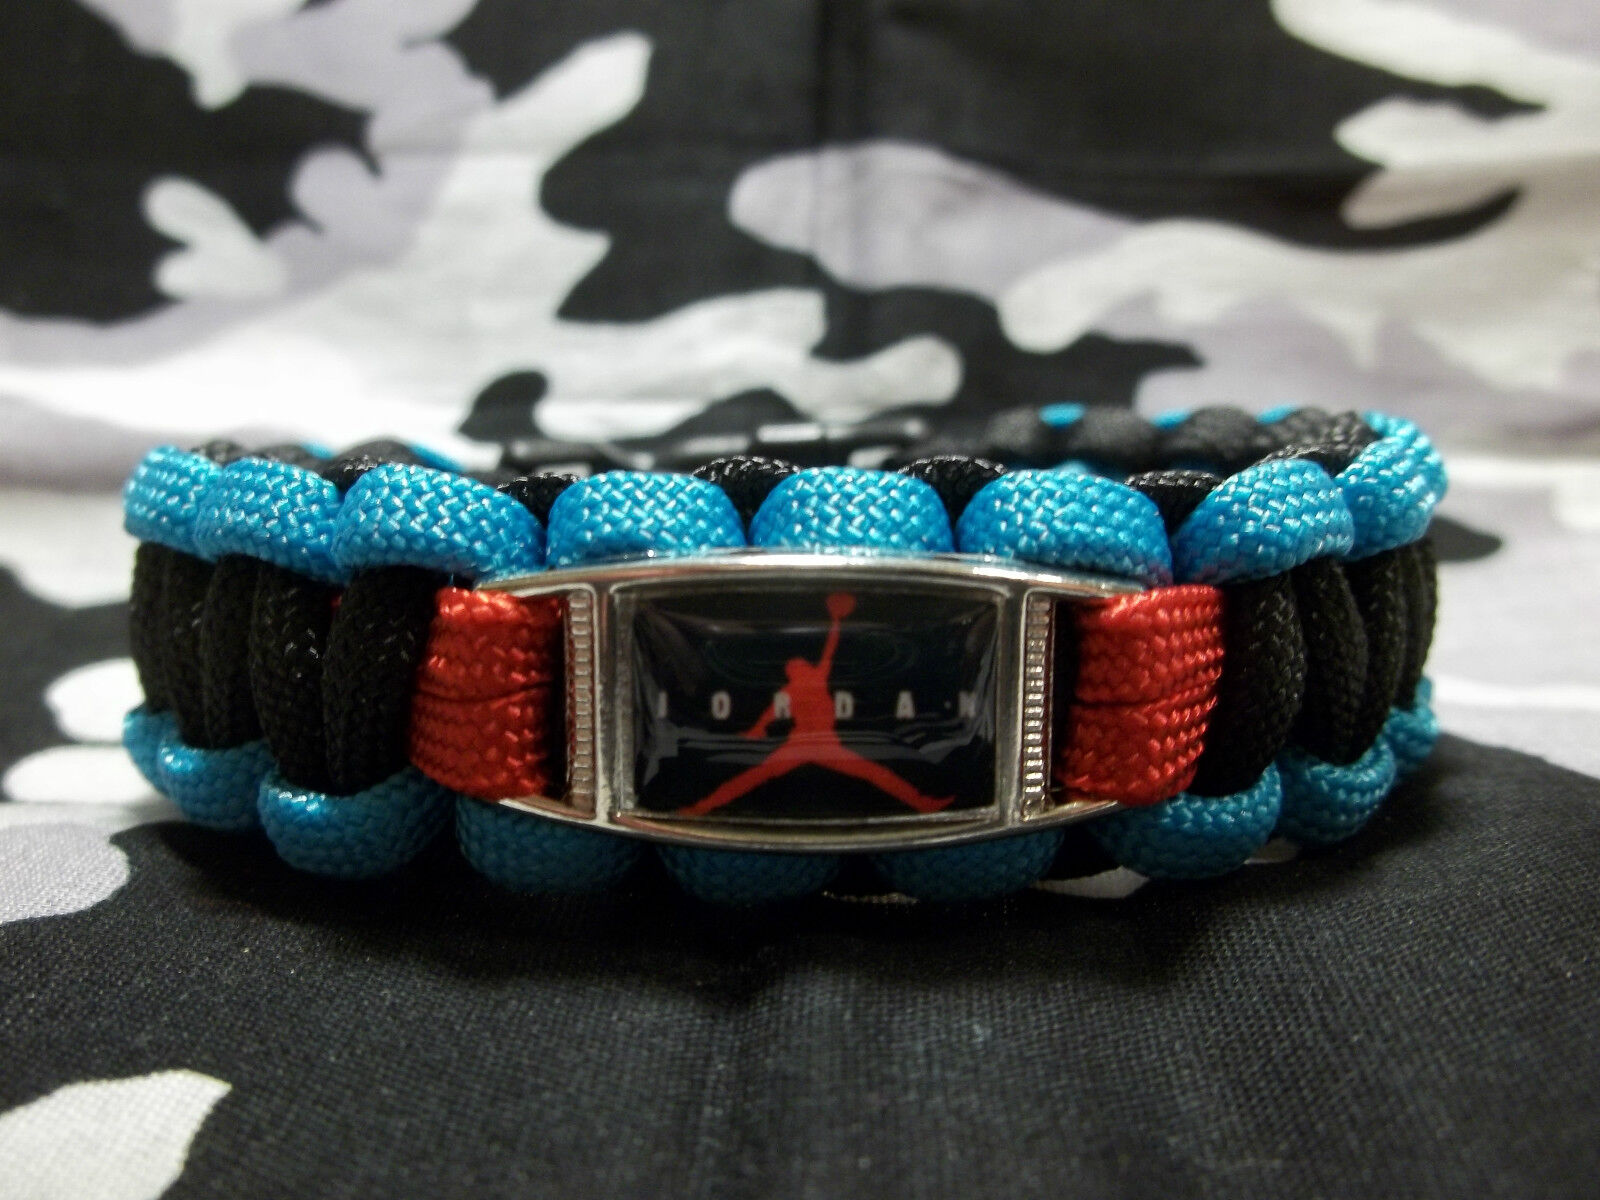 Custom Made AIR JORDAN RETRO Gama 12 Paracord Bracelet GAMMA BLUE BLACK & RED Special limited time